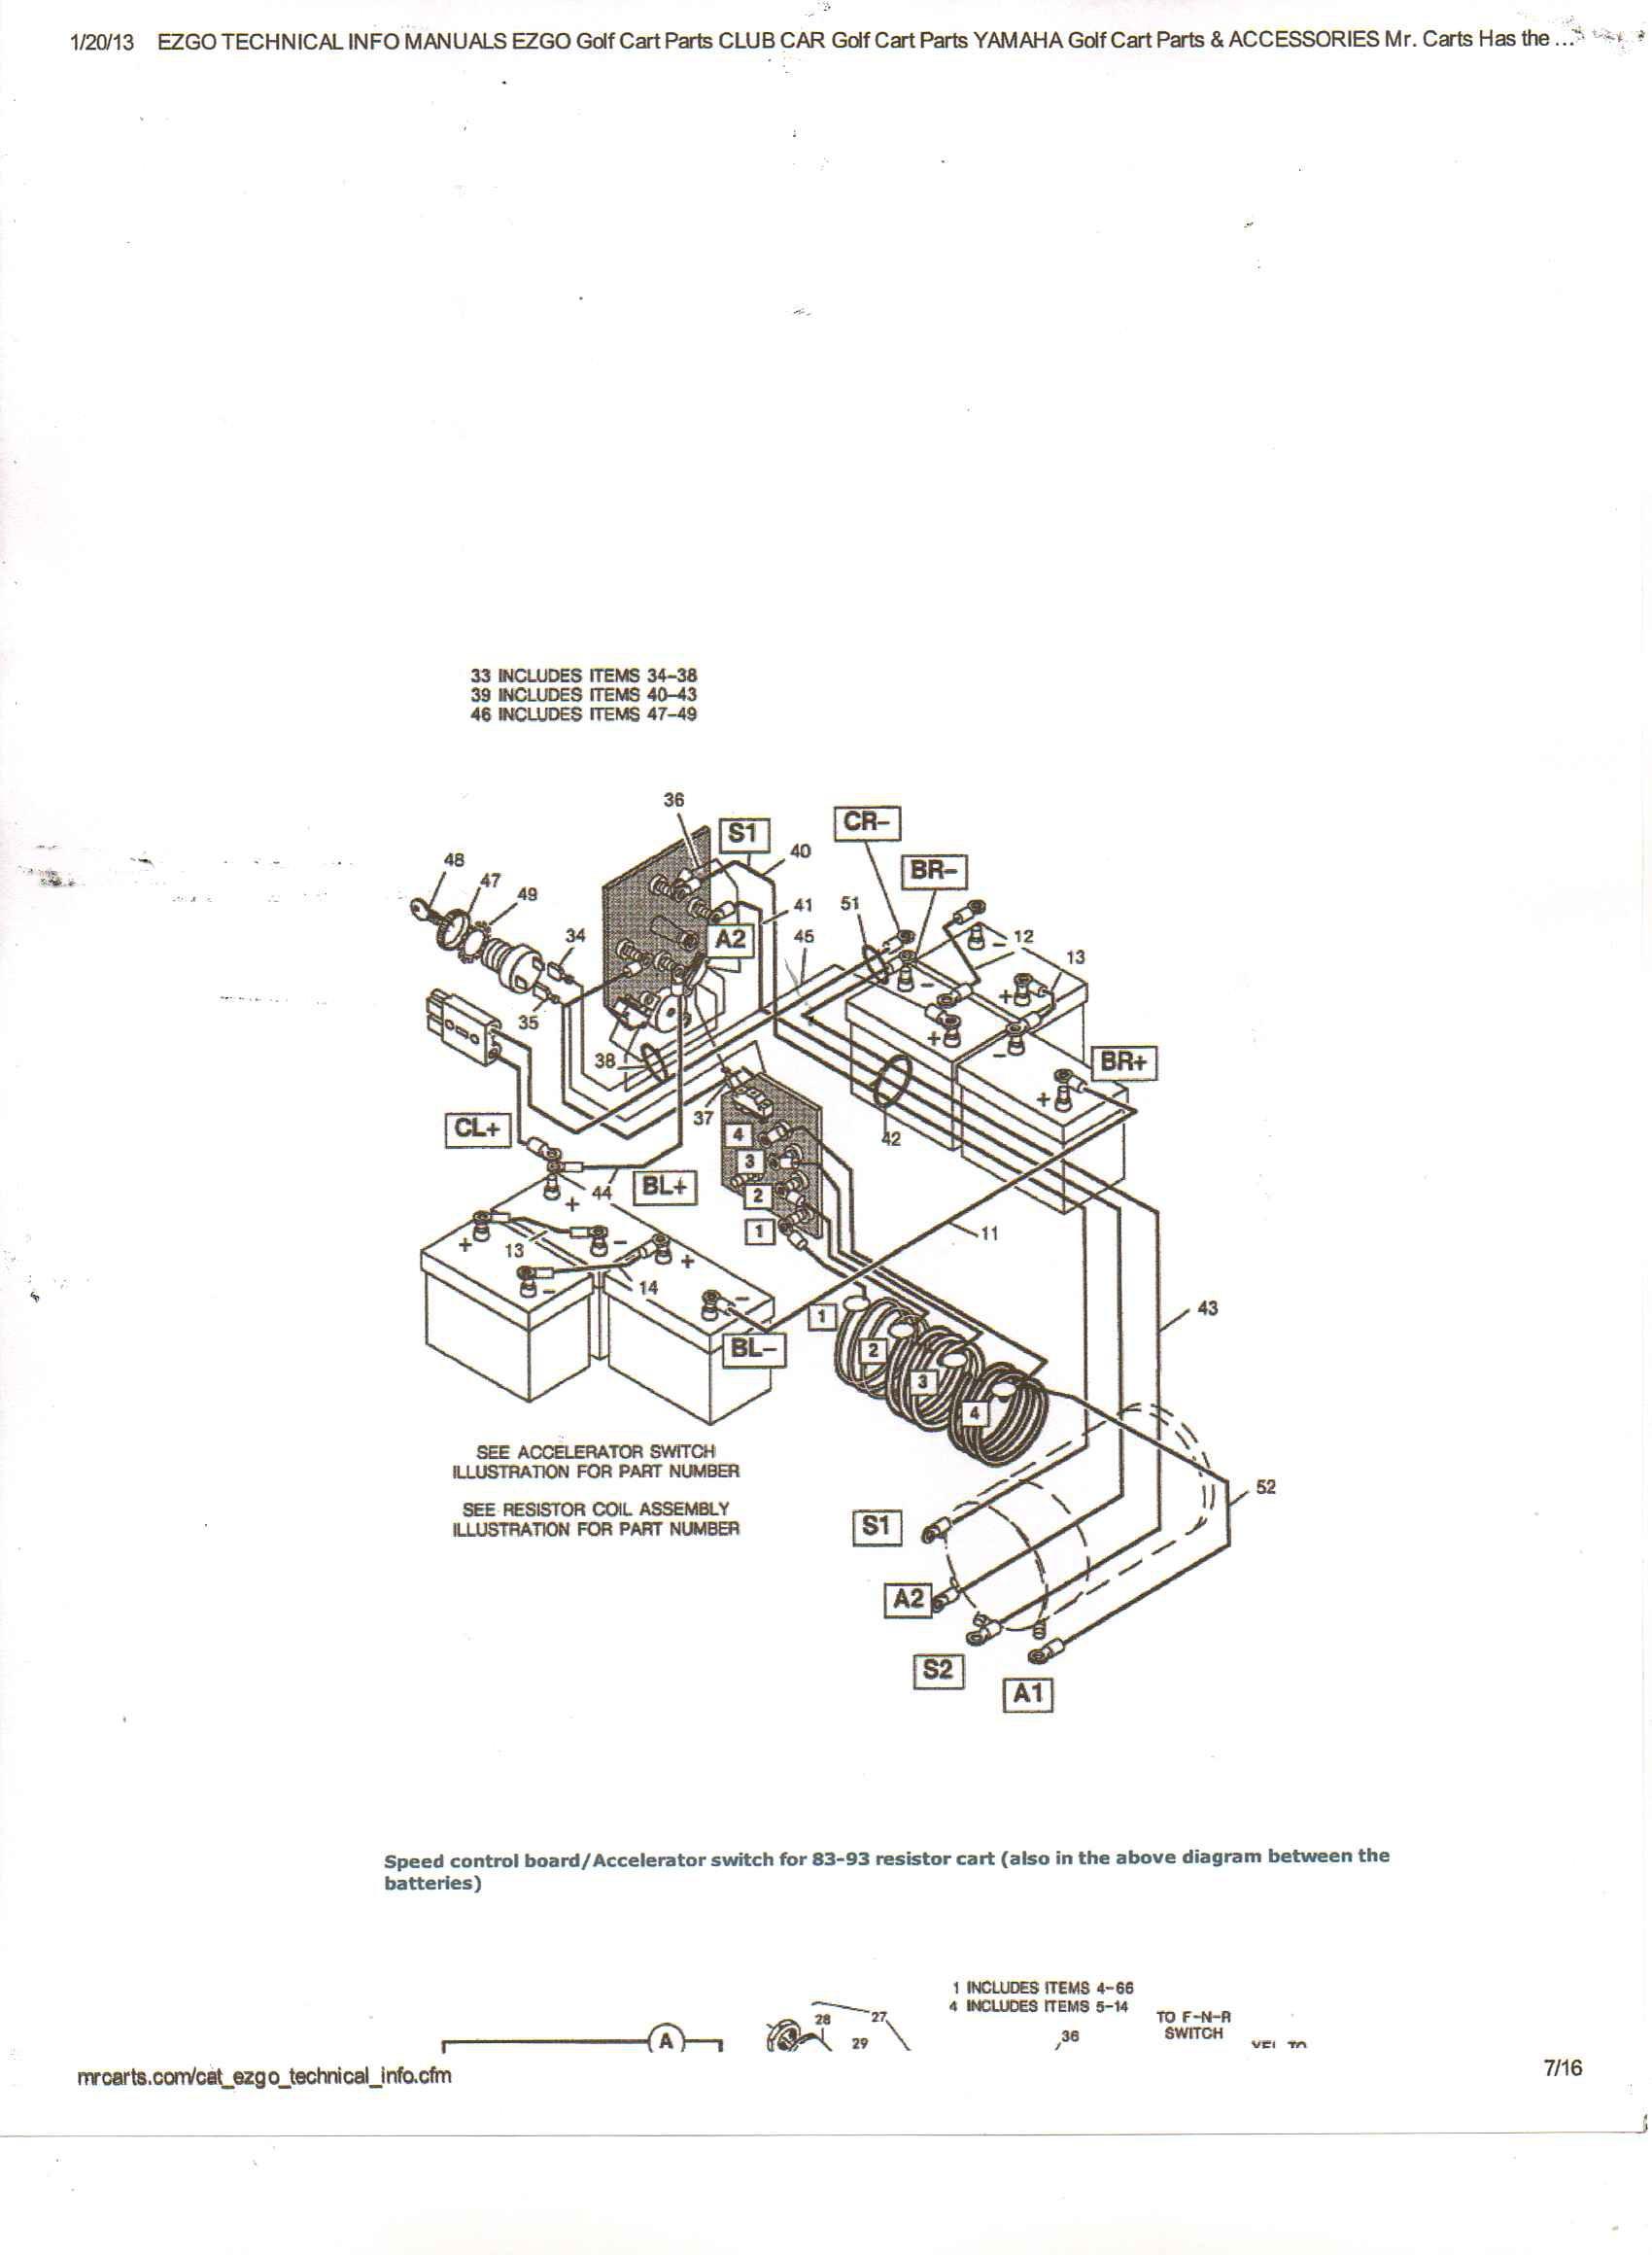 Ezgo Golf Cart Wiring Diagram Tryit Me 3 | Hastalavista - Ezgo Golf Cart Wiring Diagram